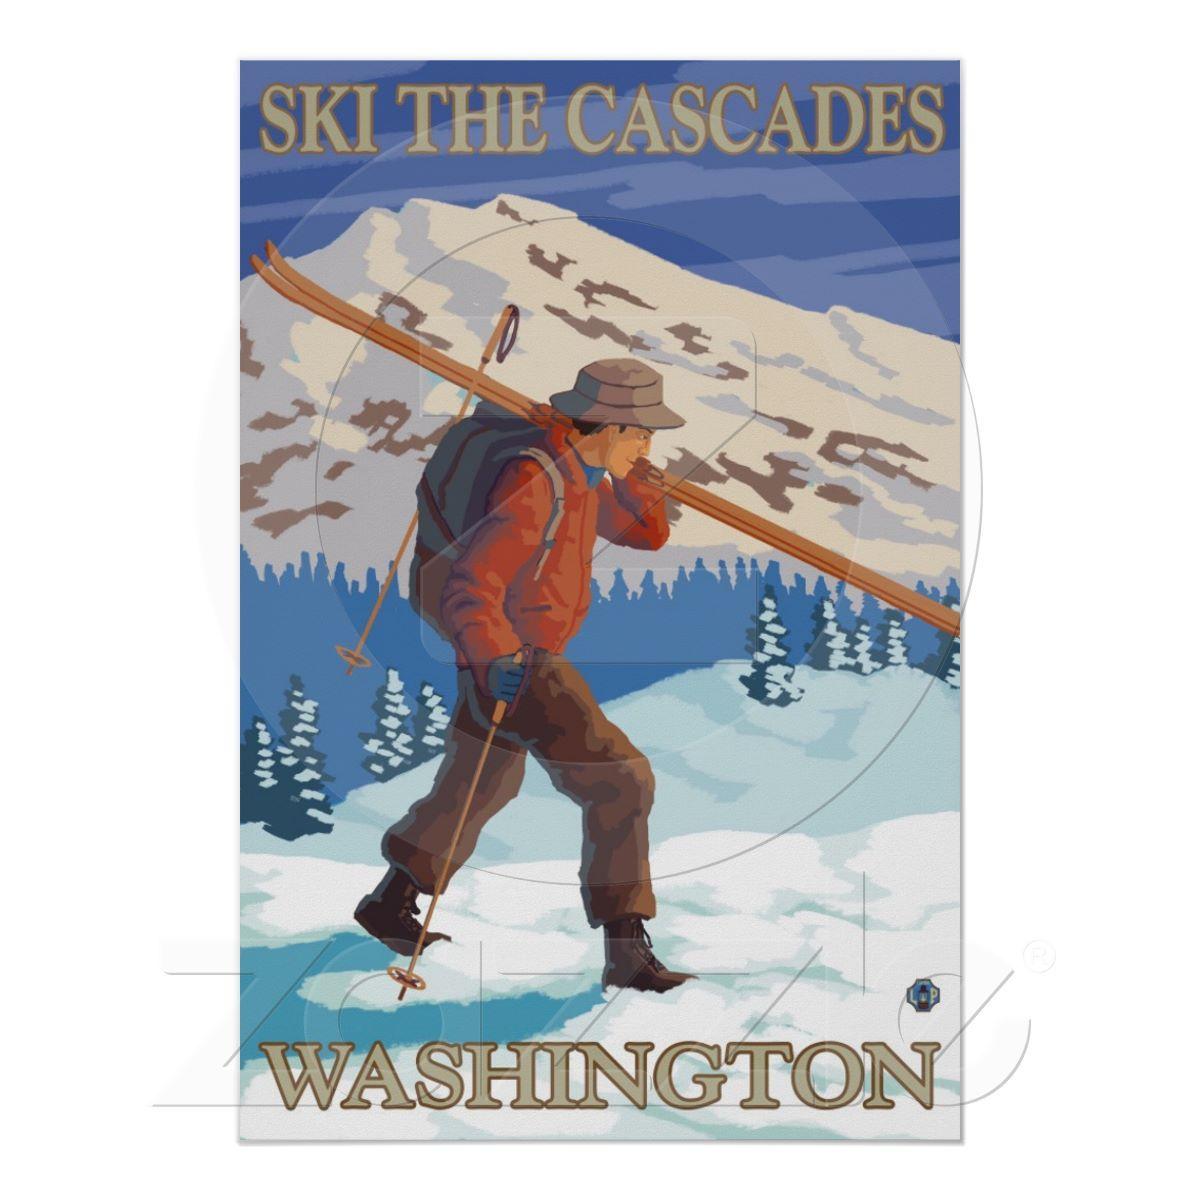 Ski The Cascades Washington State Travel Poster Zazzle Com Snow Skiing Gallery Print Lantern Press